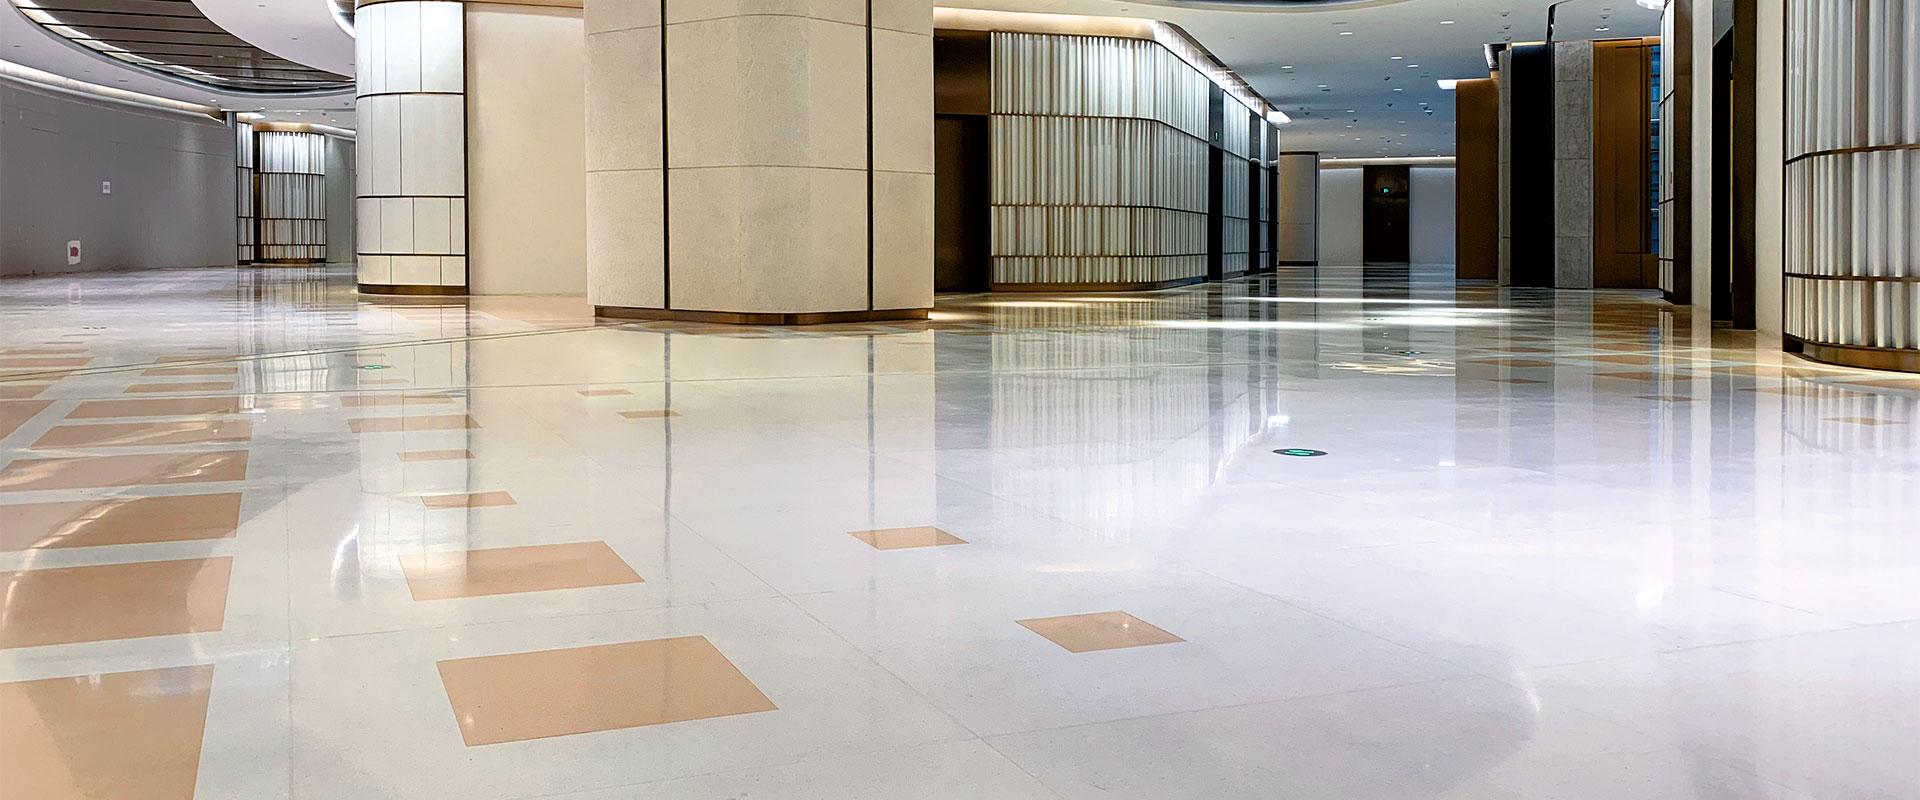 bfc-mall---shanghai-cina---SB-138-SB-137-SB-149-SB-139---retail-01---OK